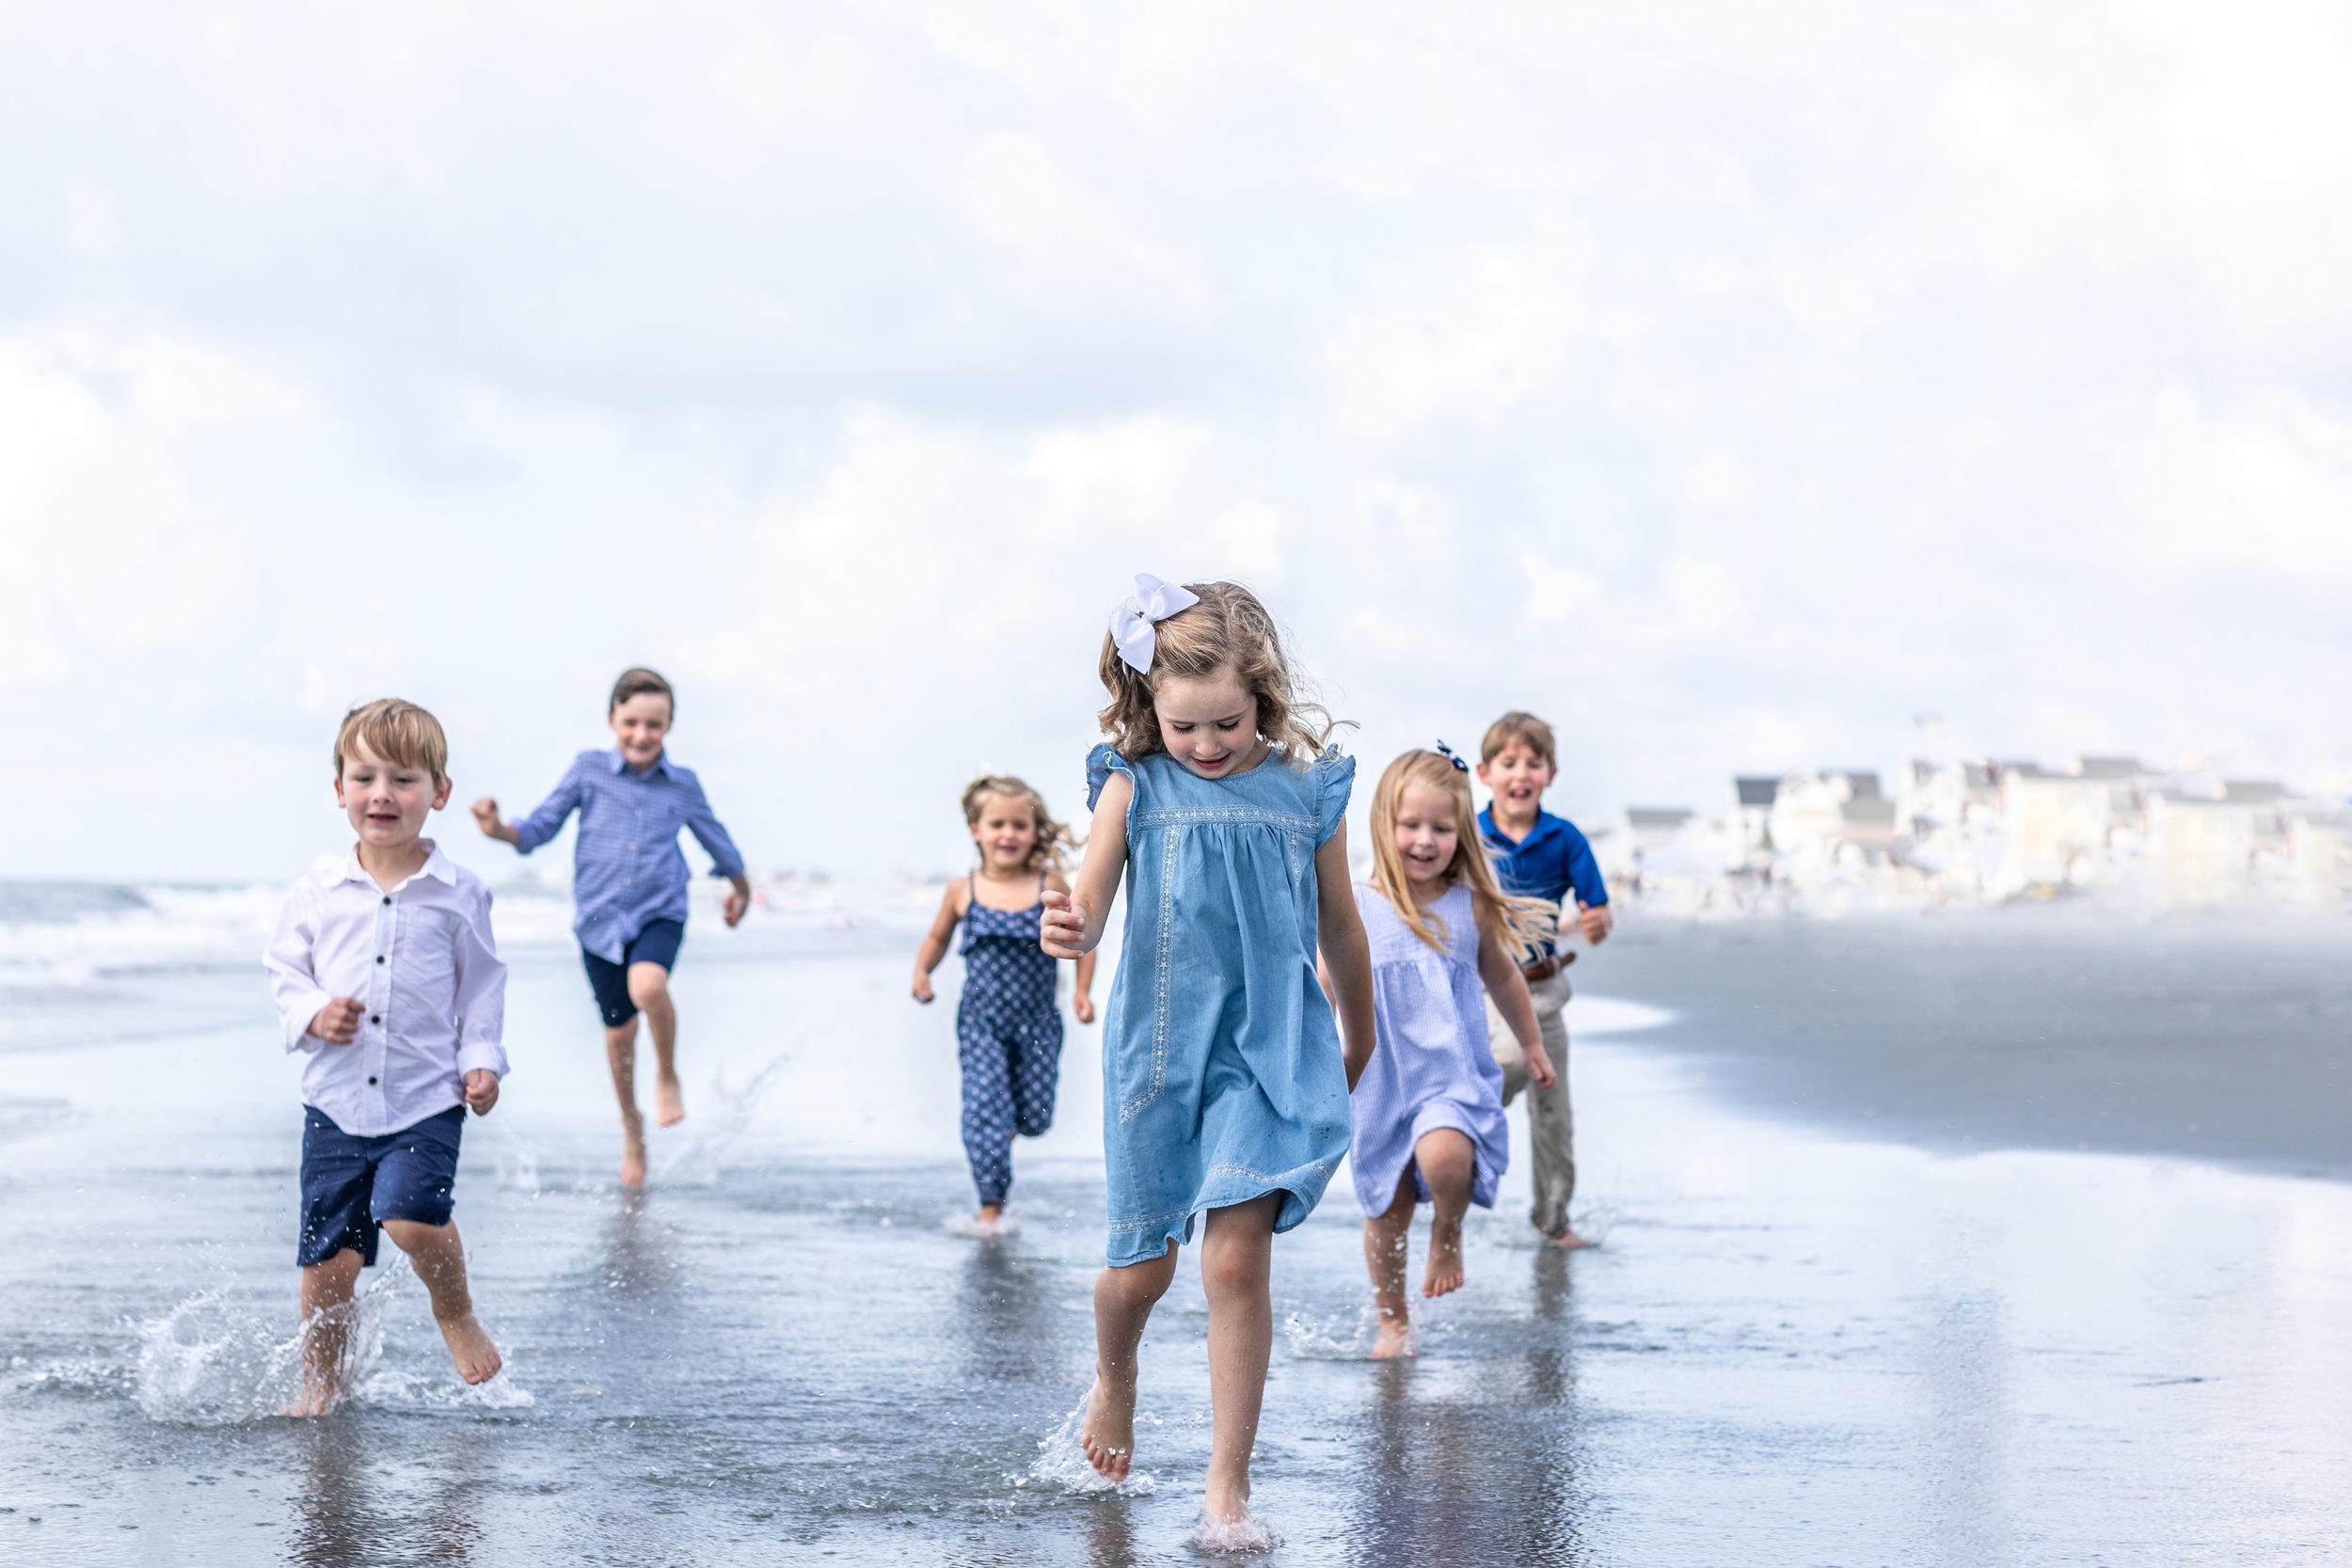 Kids Running on the Beach Beginning of Summer-1.jpg